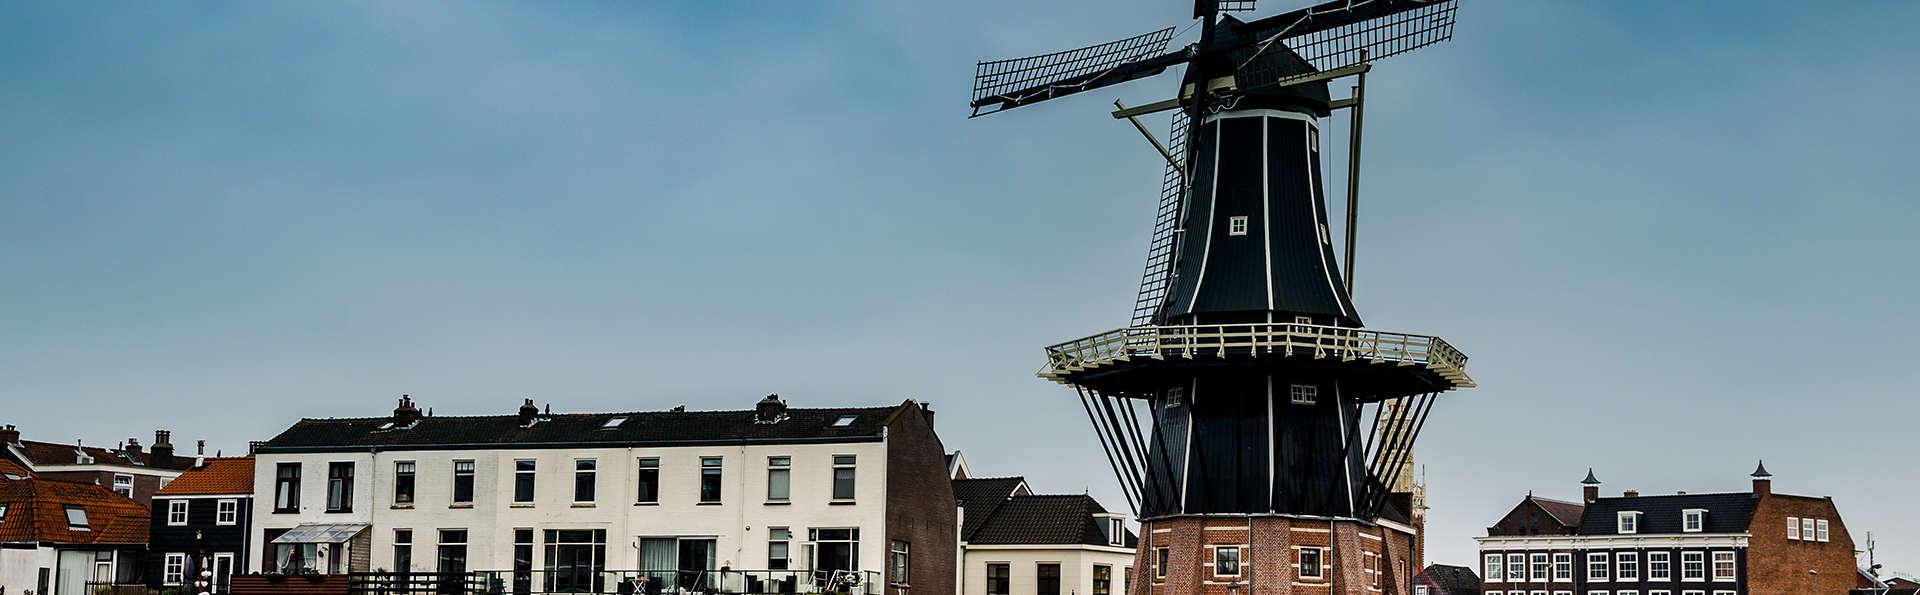 Fletcher Hotel Restaurant Spaarnwoude - EDIT_NEW_Haarlem2.jpg